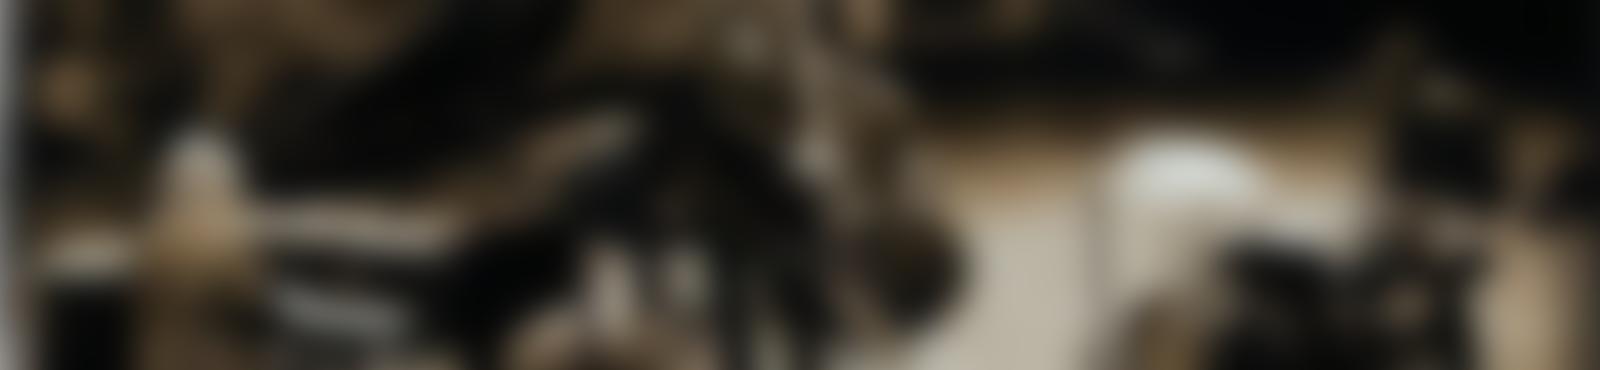 Blurred f9691750 3b08 445c 93c8 8aeed7a02bf1